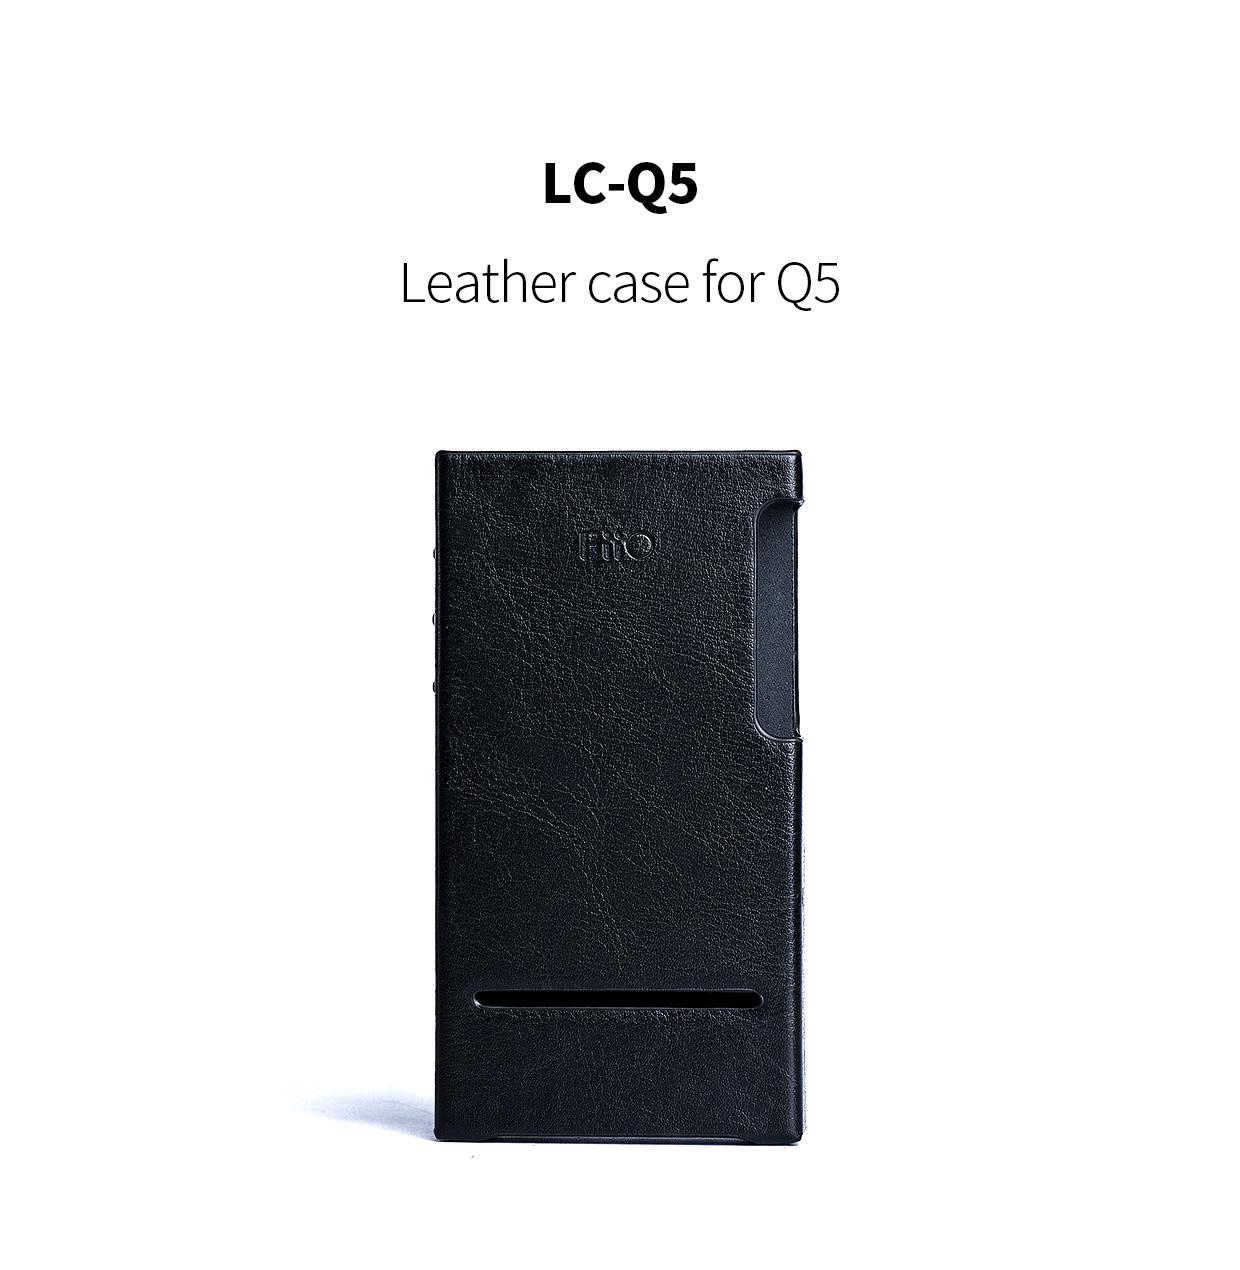 Bao đựng FiiO LC-Q5 Leather Case